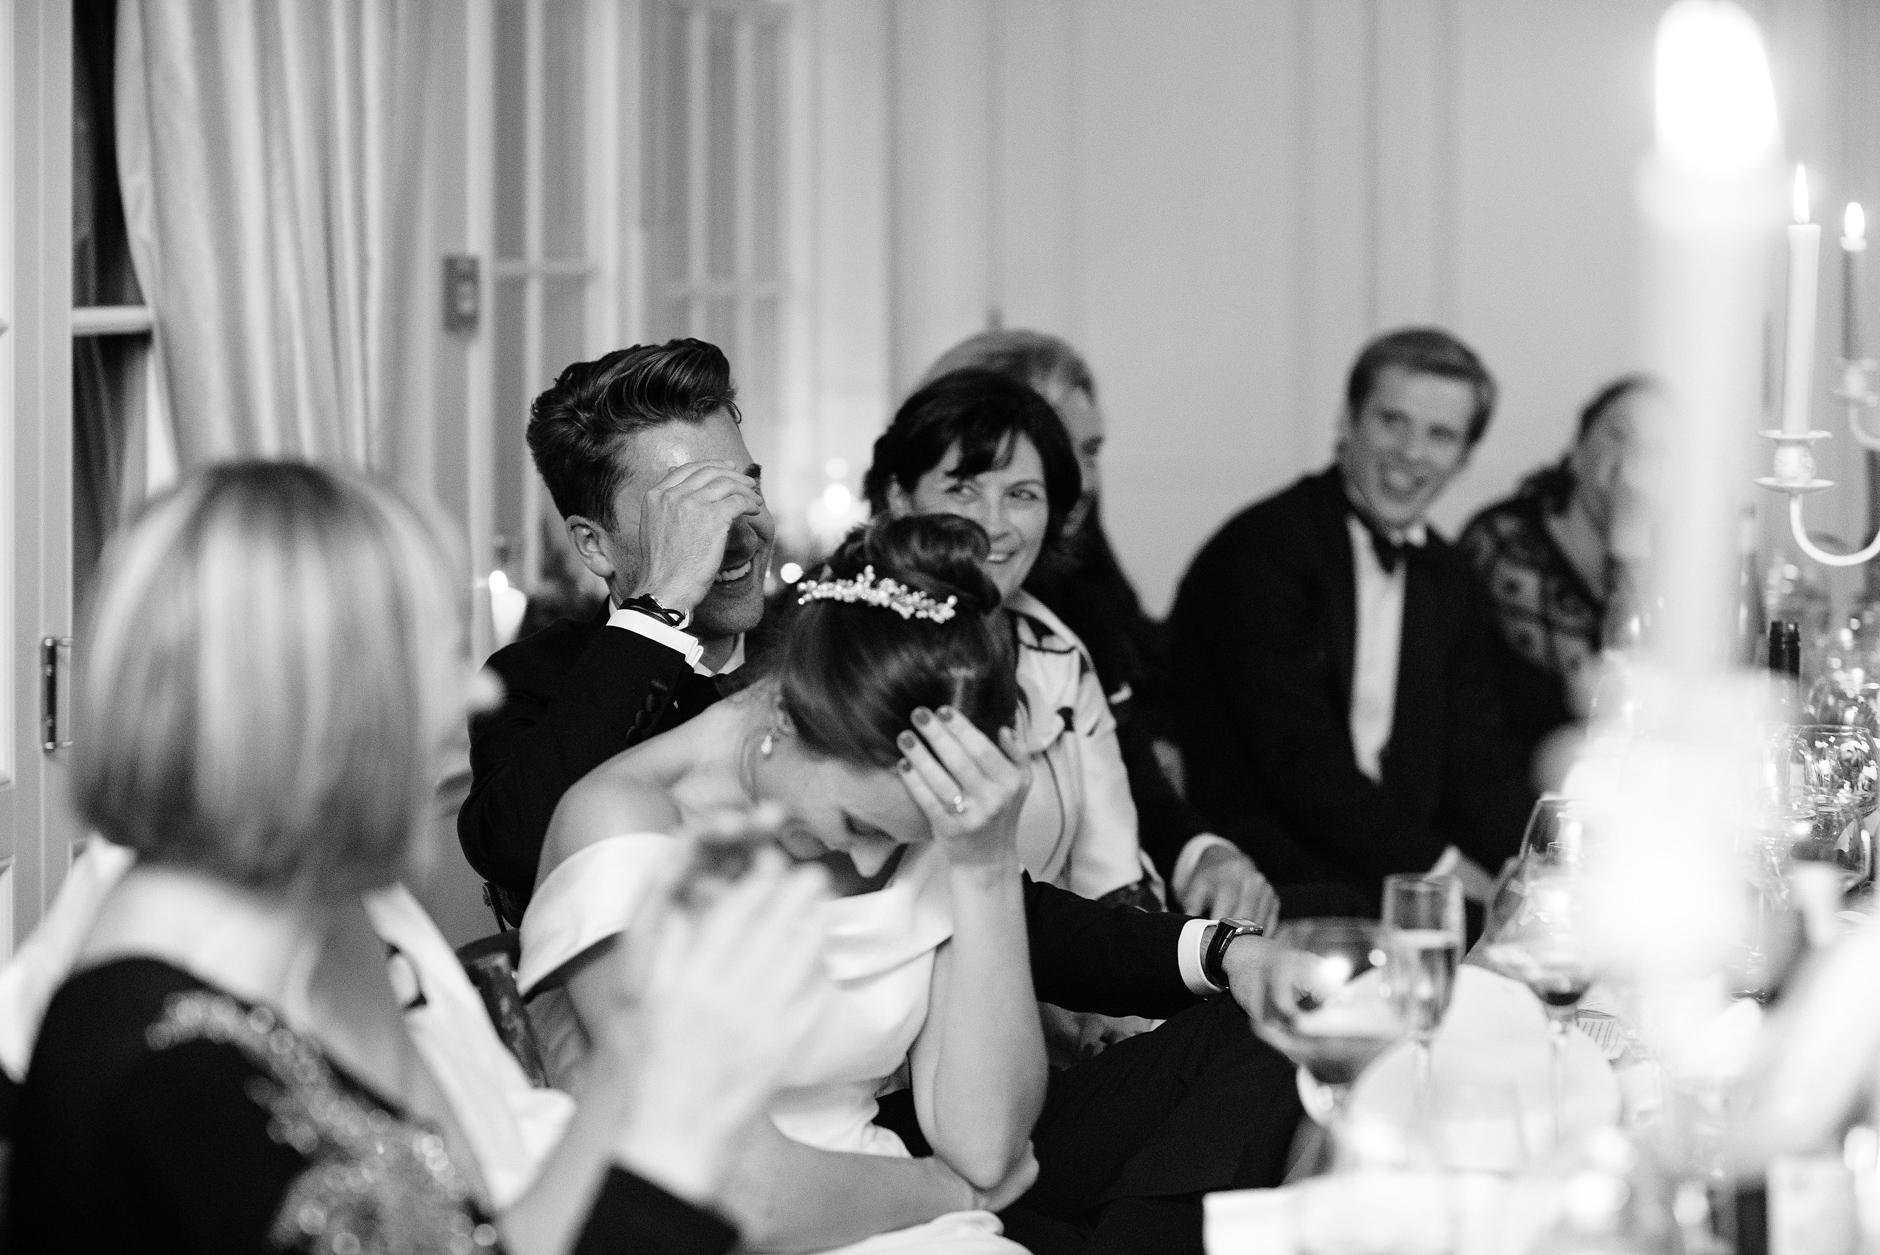 Glentruim-Wedding-Nikki-Leadbetter-Photography-319.jpg